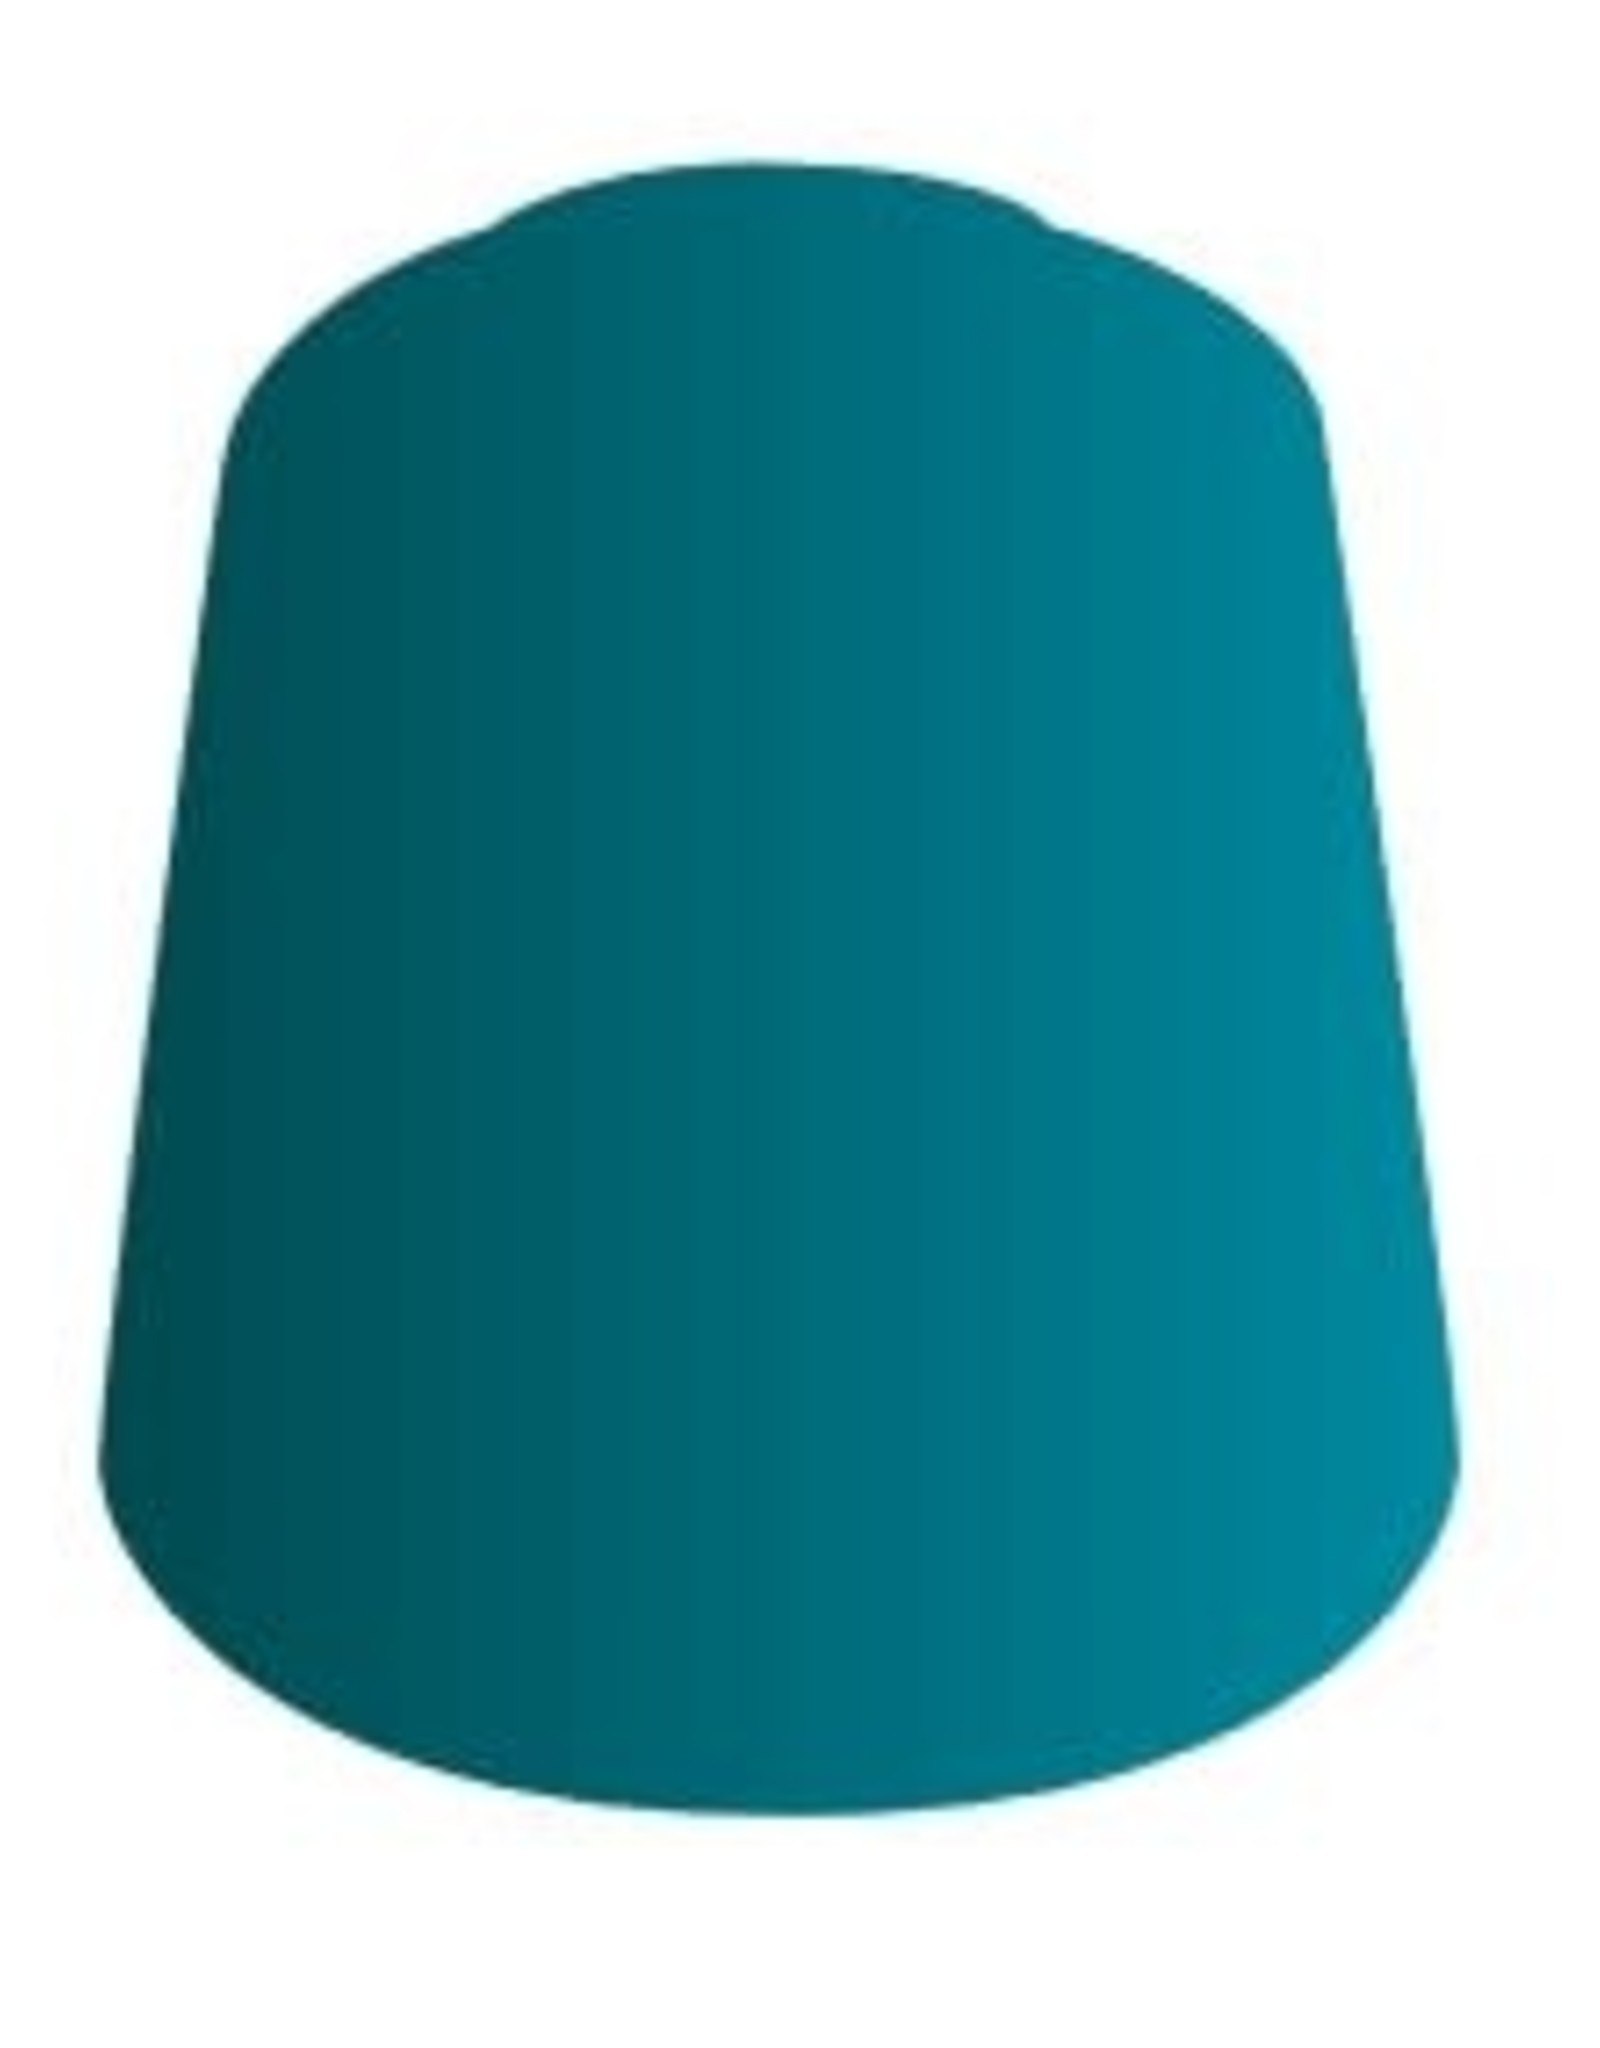 Games Workshop Contrast Terradon Turquoise